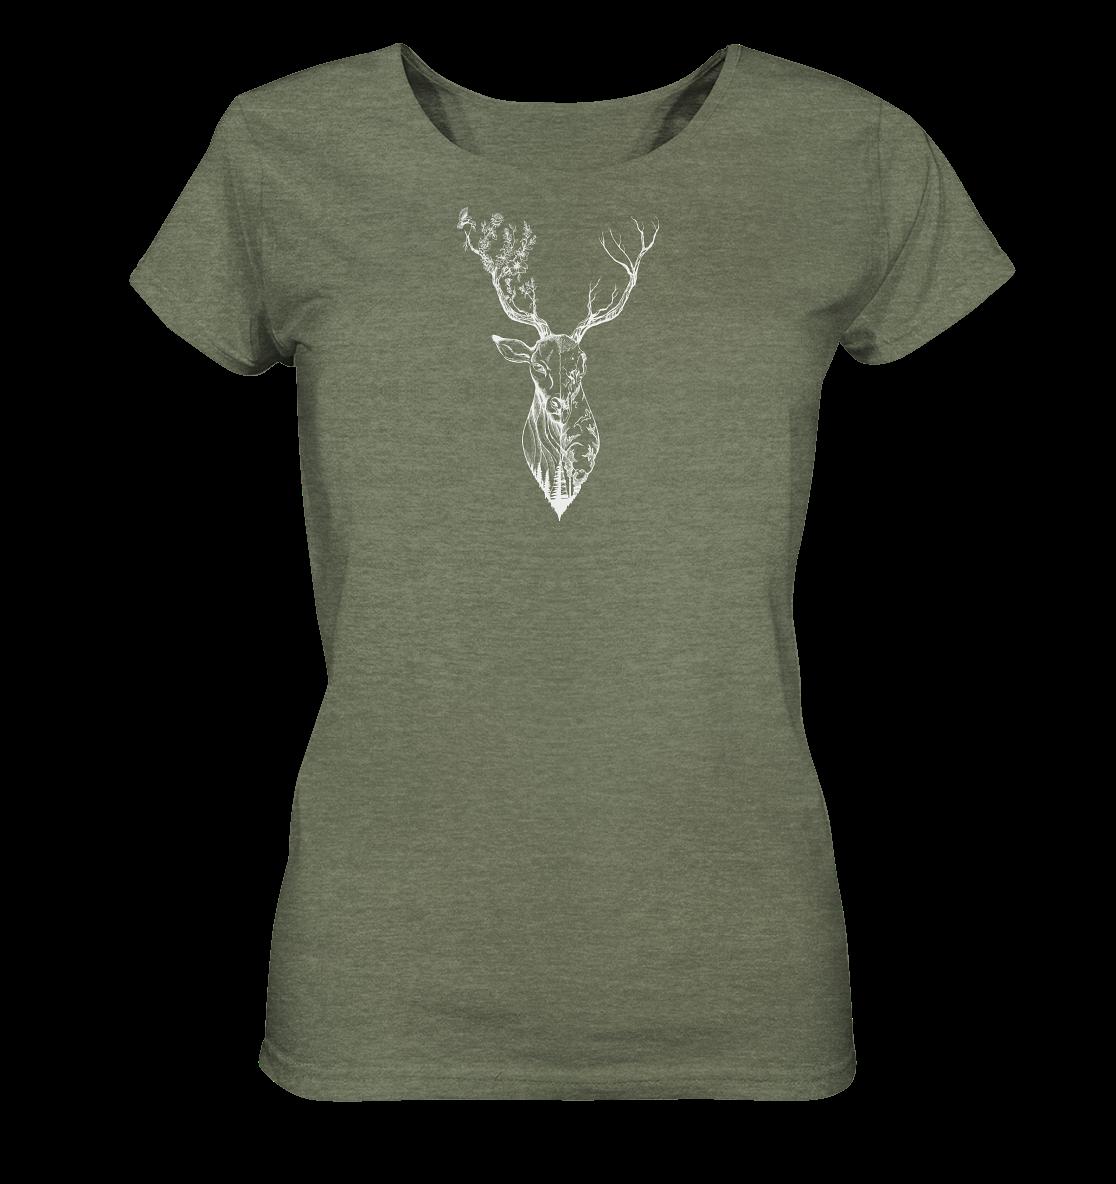 front-ladies-organic-shirt-meliert-616b52-1116x-8.png